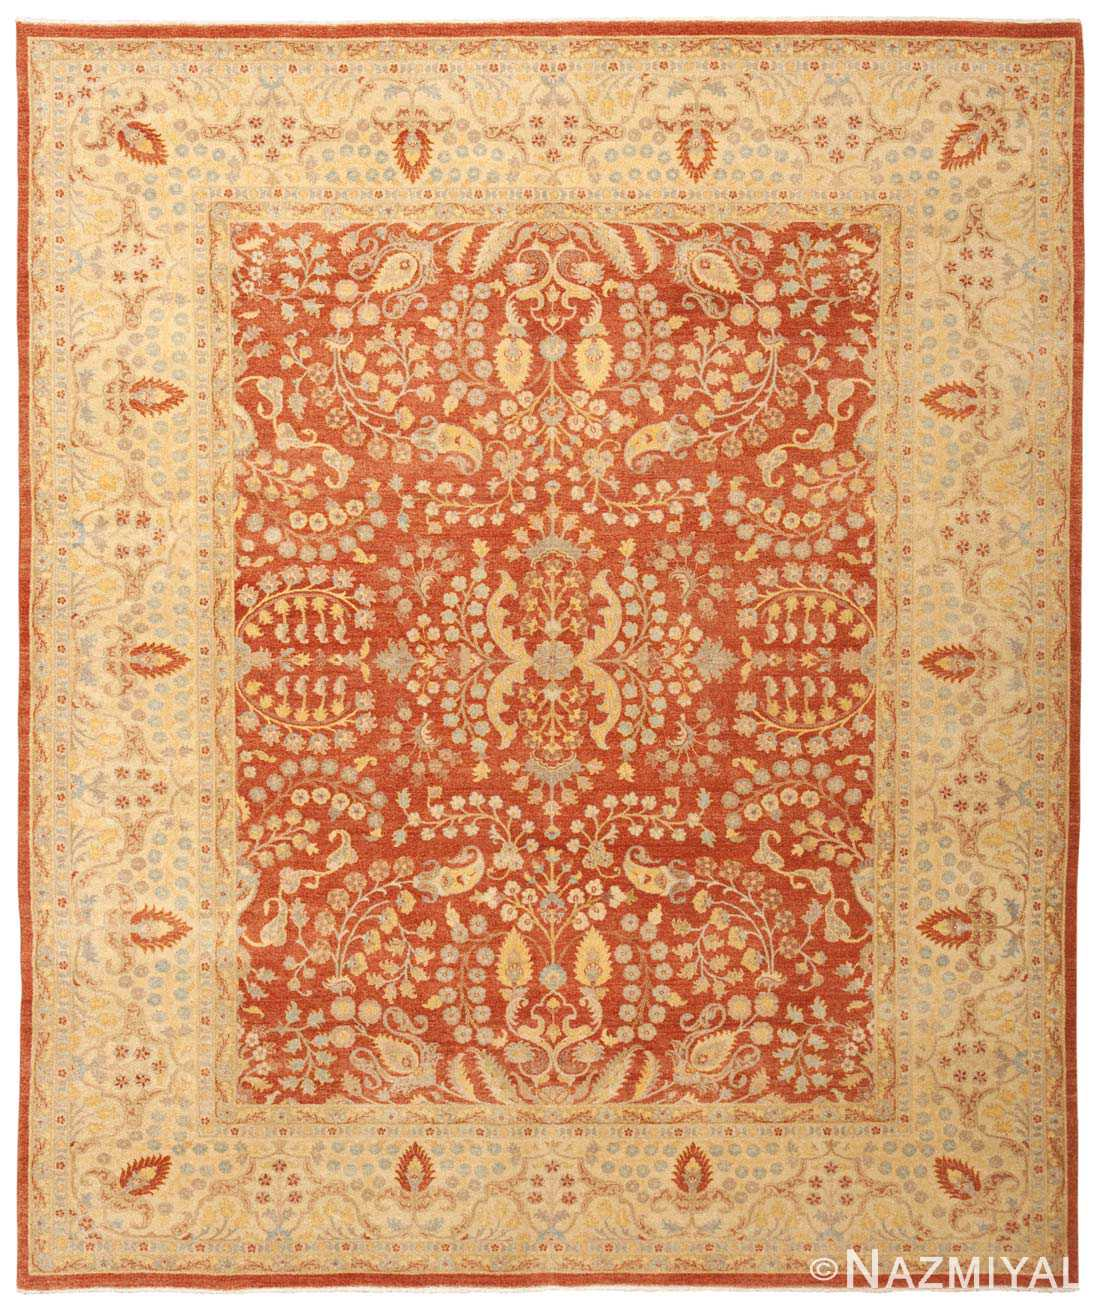 Modern Persian Tabriz Design Rug 44687 Nazmiyal Antique Rugs